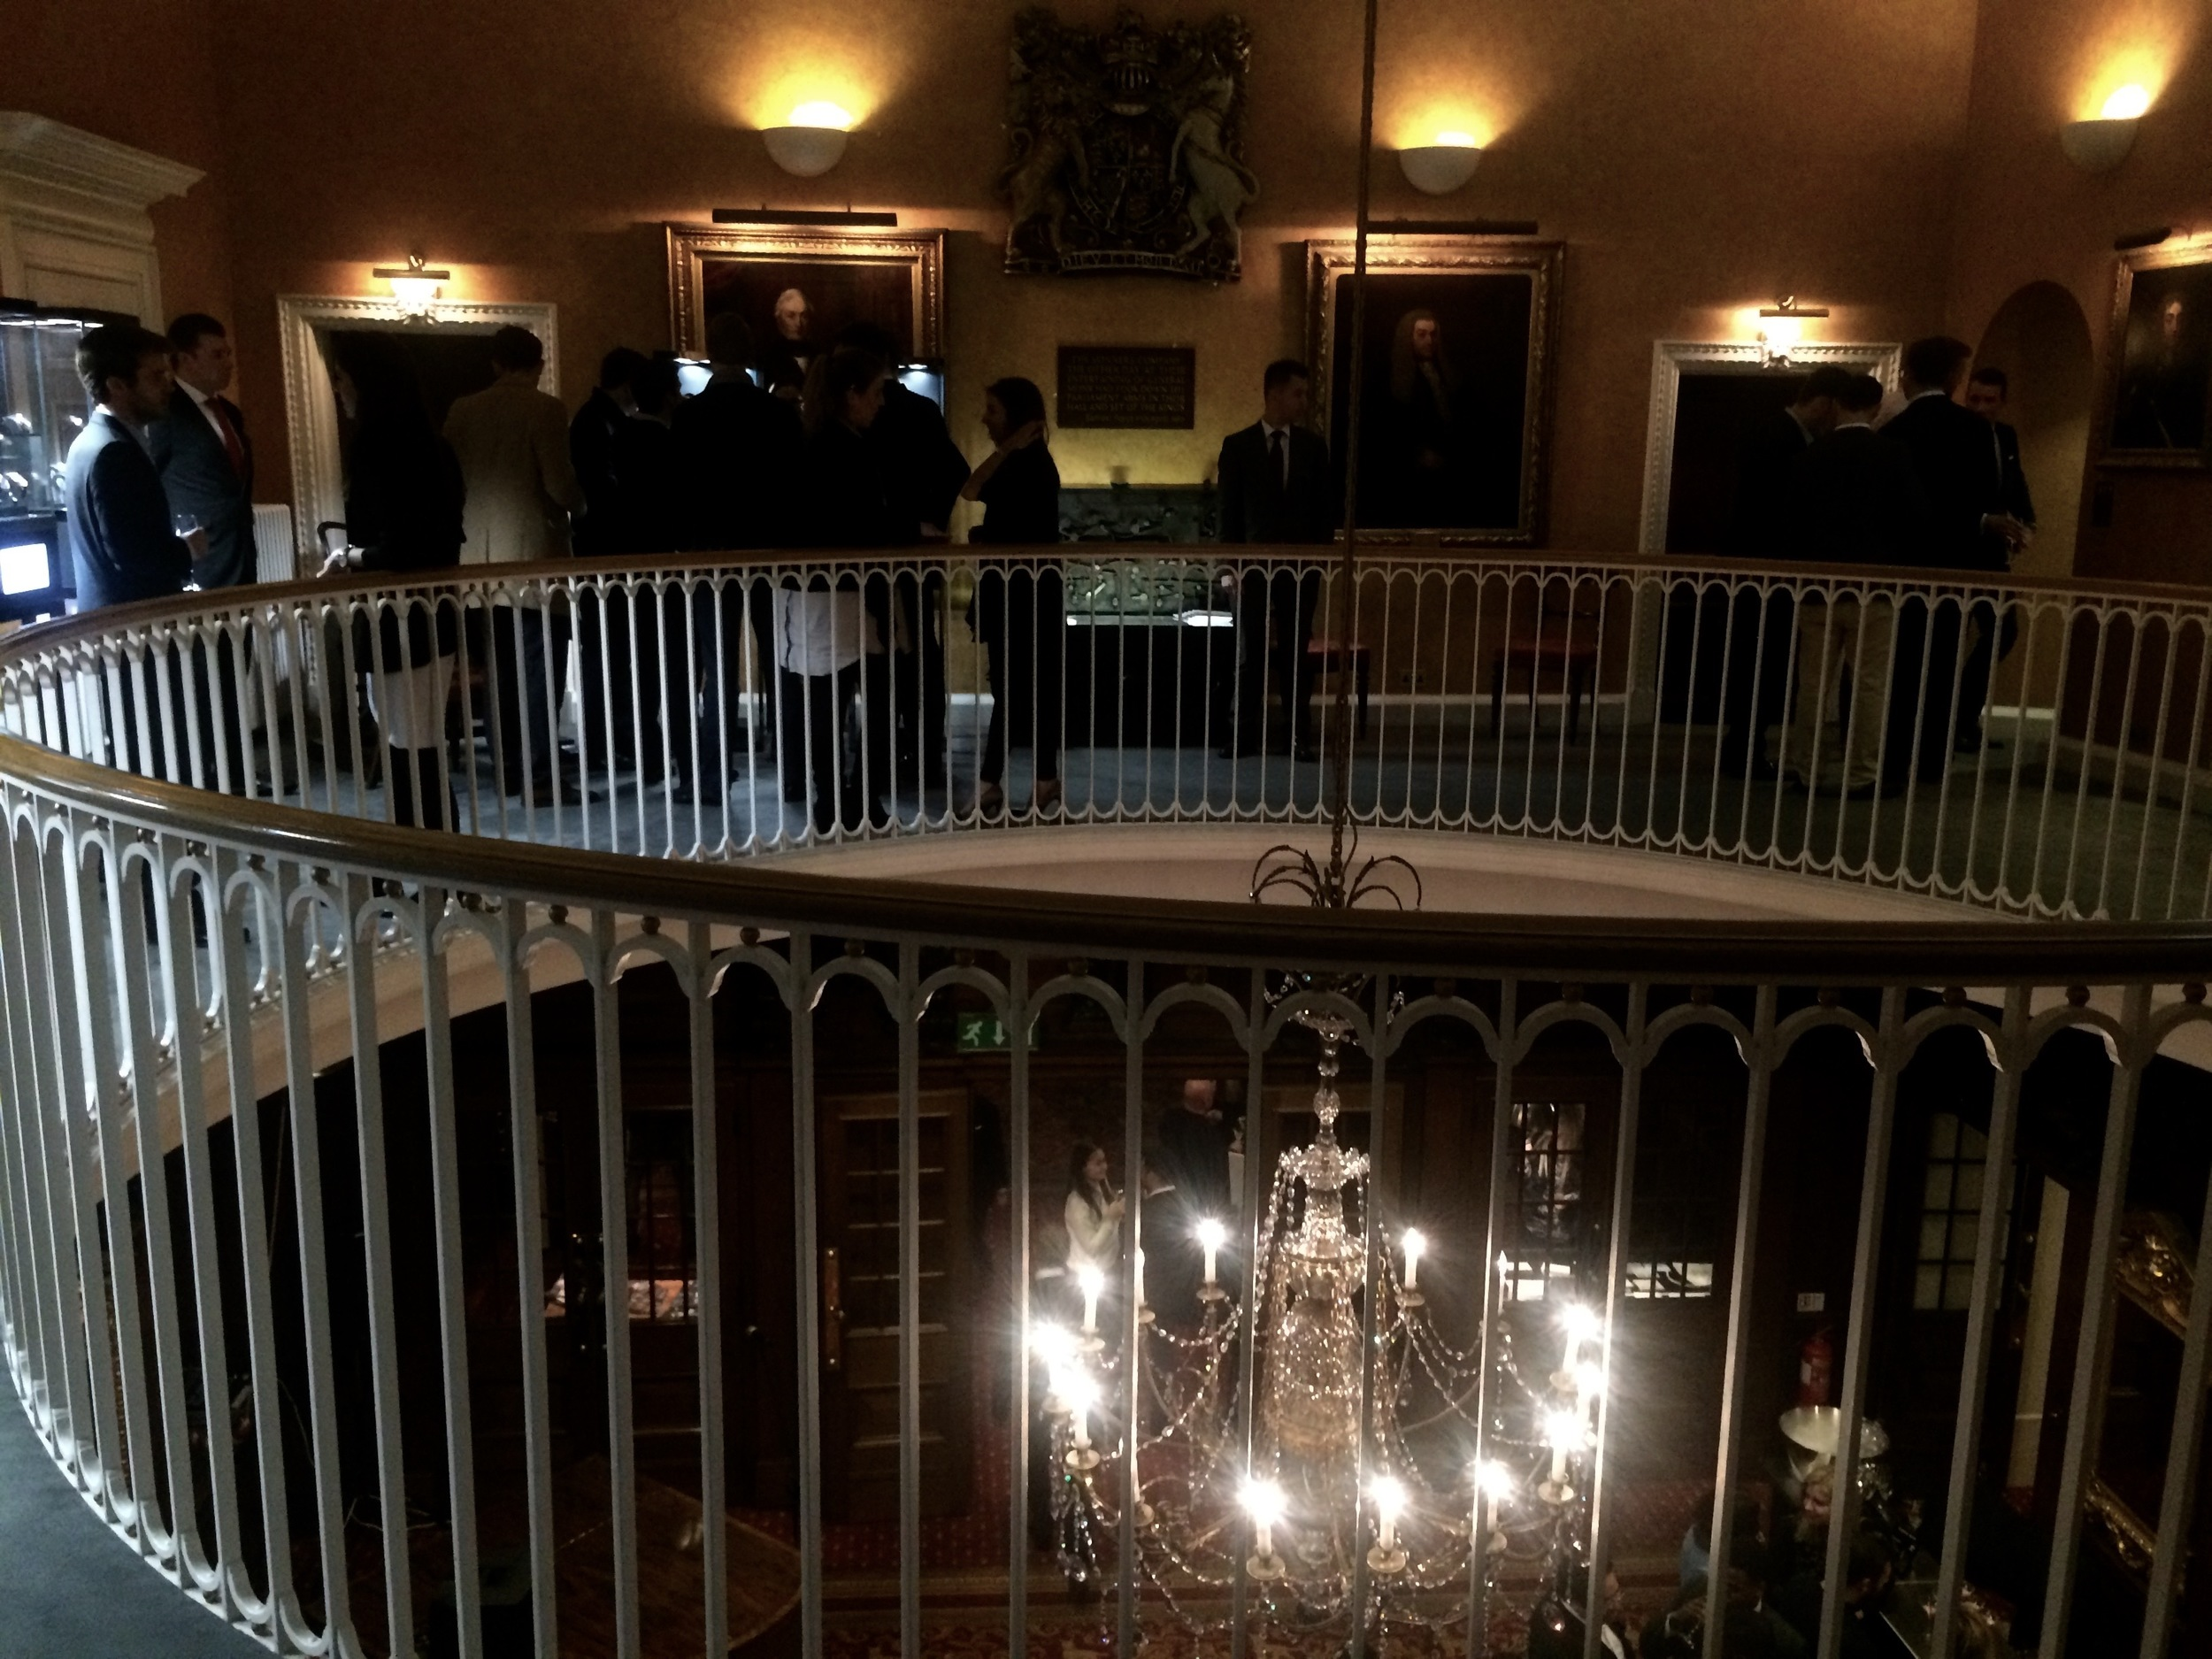 The rotunda watch gallery